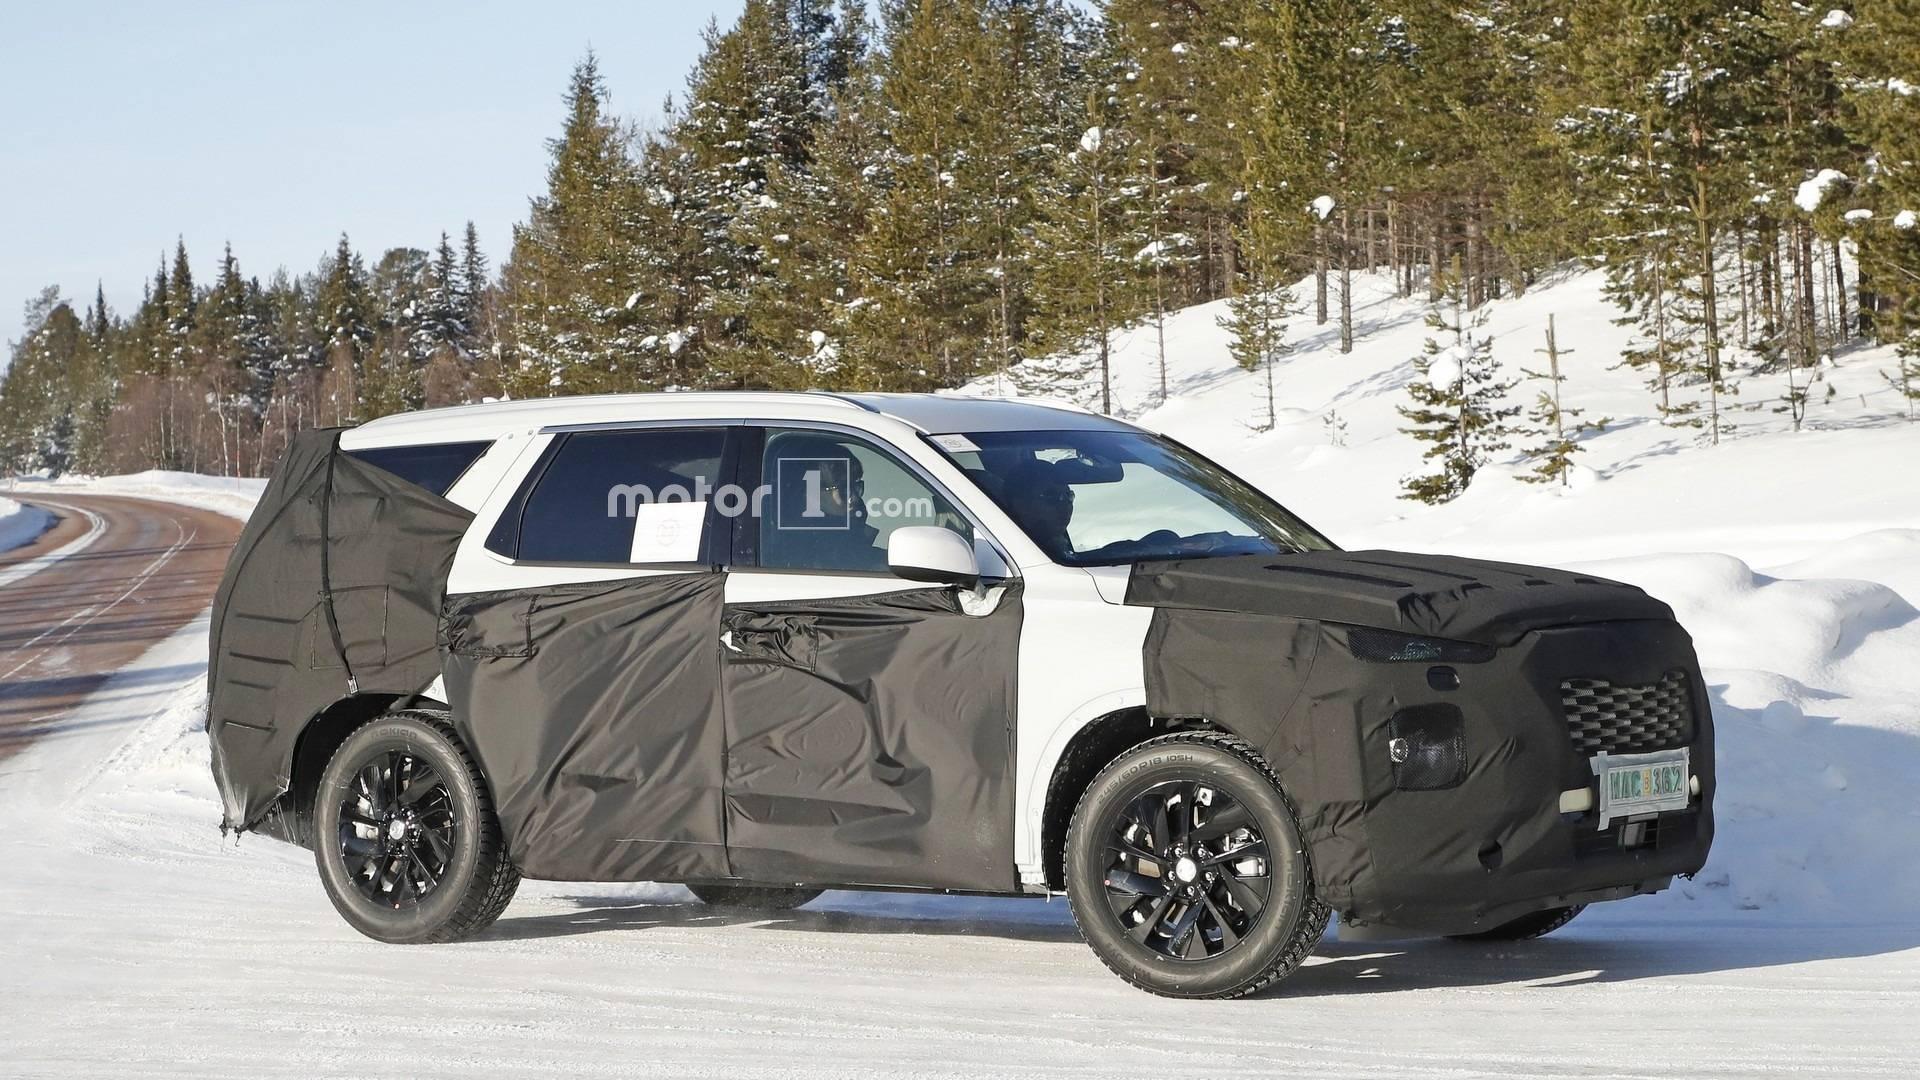 8 Seater Suv >> 8 Seat Hyundai Suv Makes 18 Inch Wheels Look Small In Spy Shots